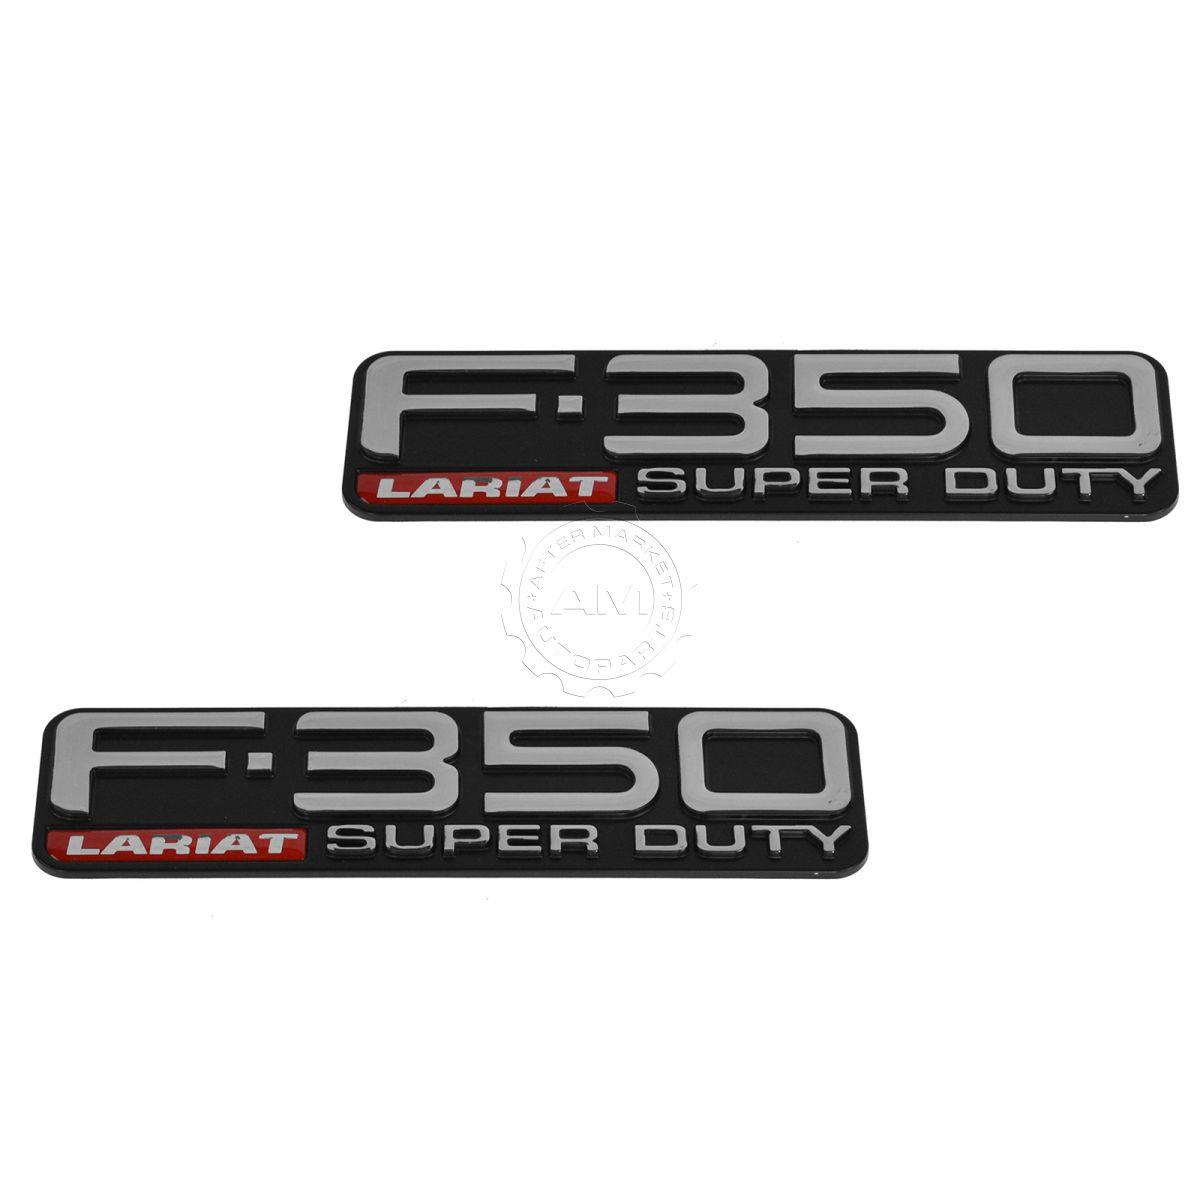 Z0885 1999 2000 2001 2002 2003 2004 2005 GRAND AM Drilled Brake Rotors Pads F